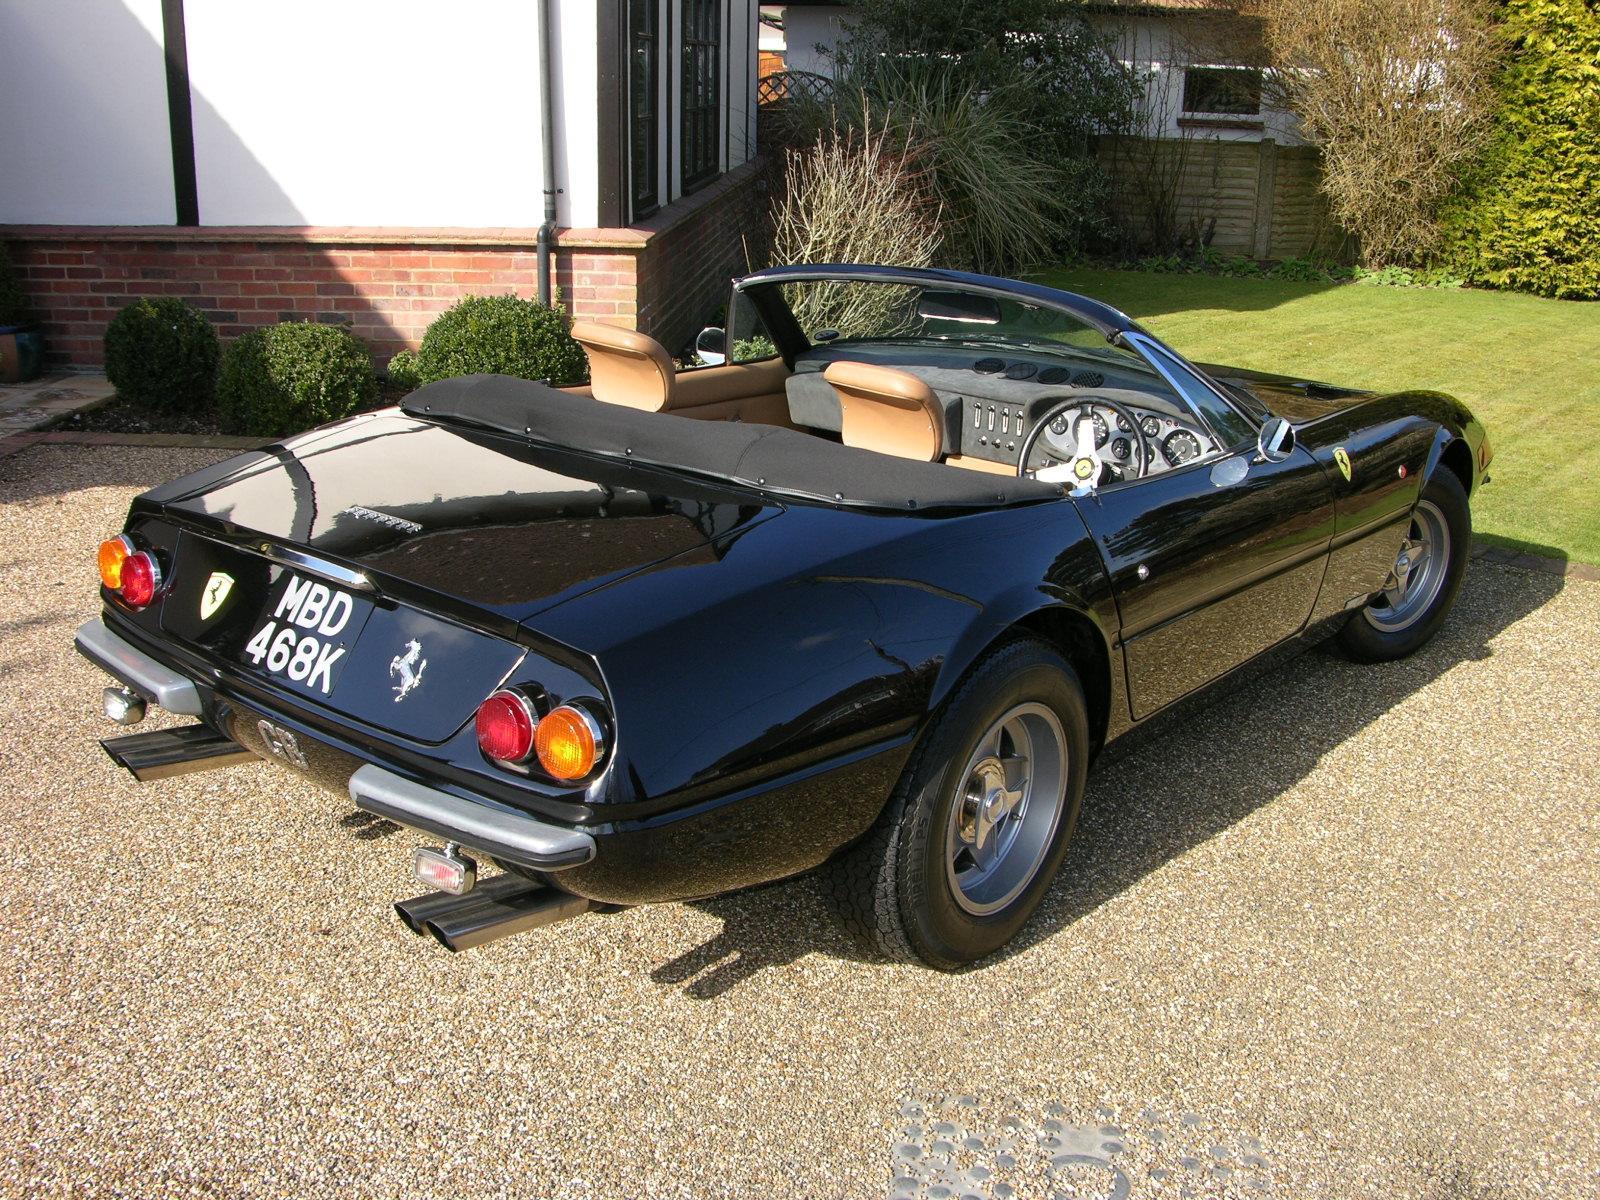 File:Ferrari 365 GTS-4 'Daytona' Spyder Replica - Flickr - The Car Spy ...